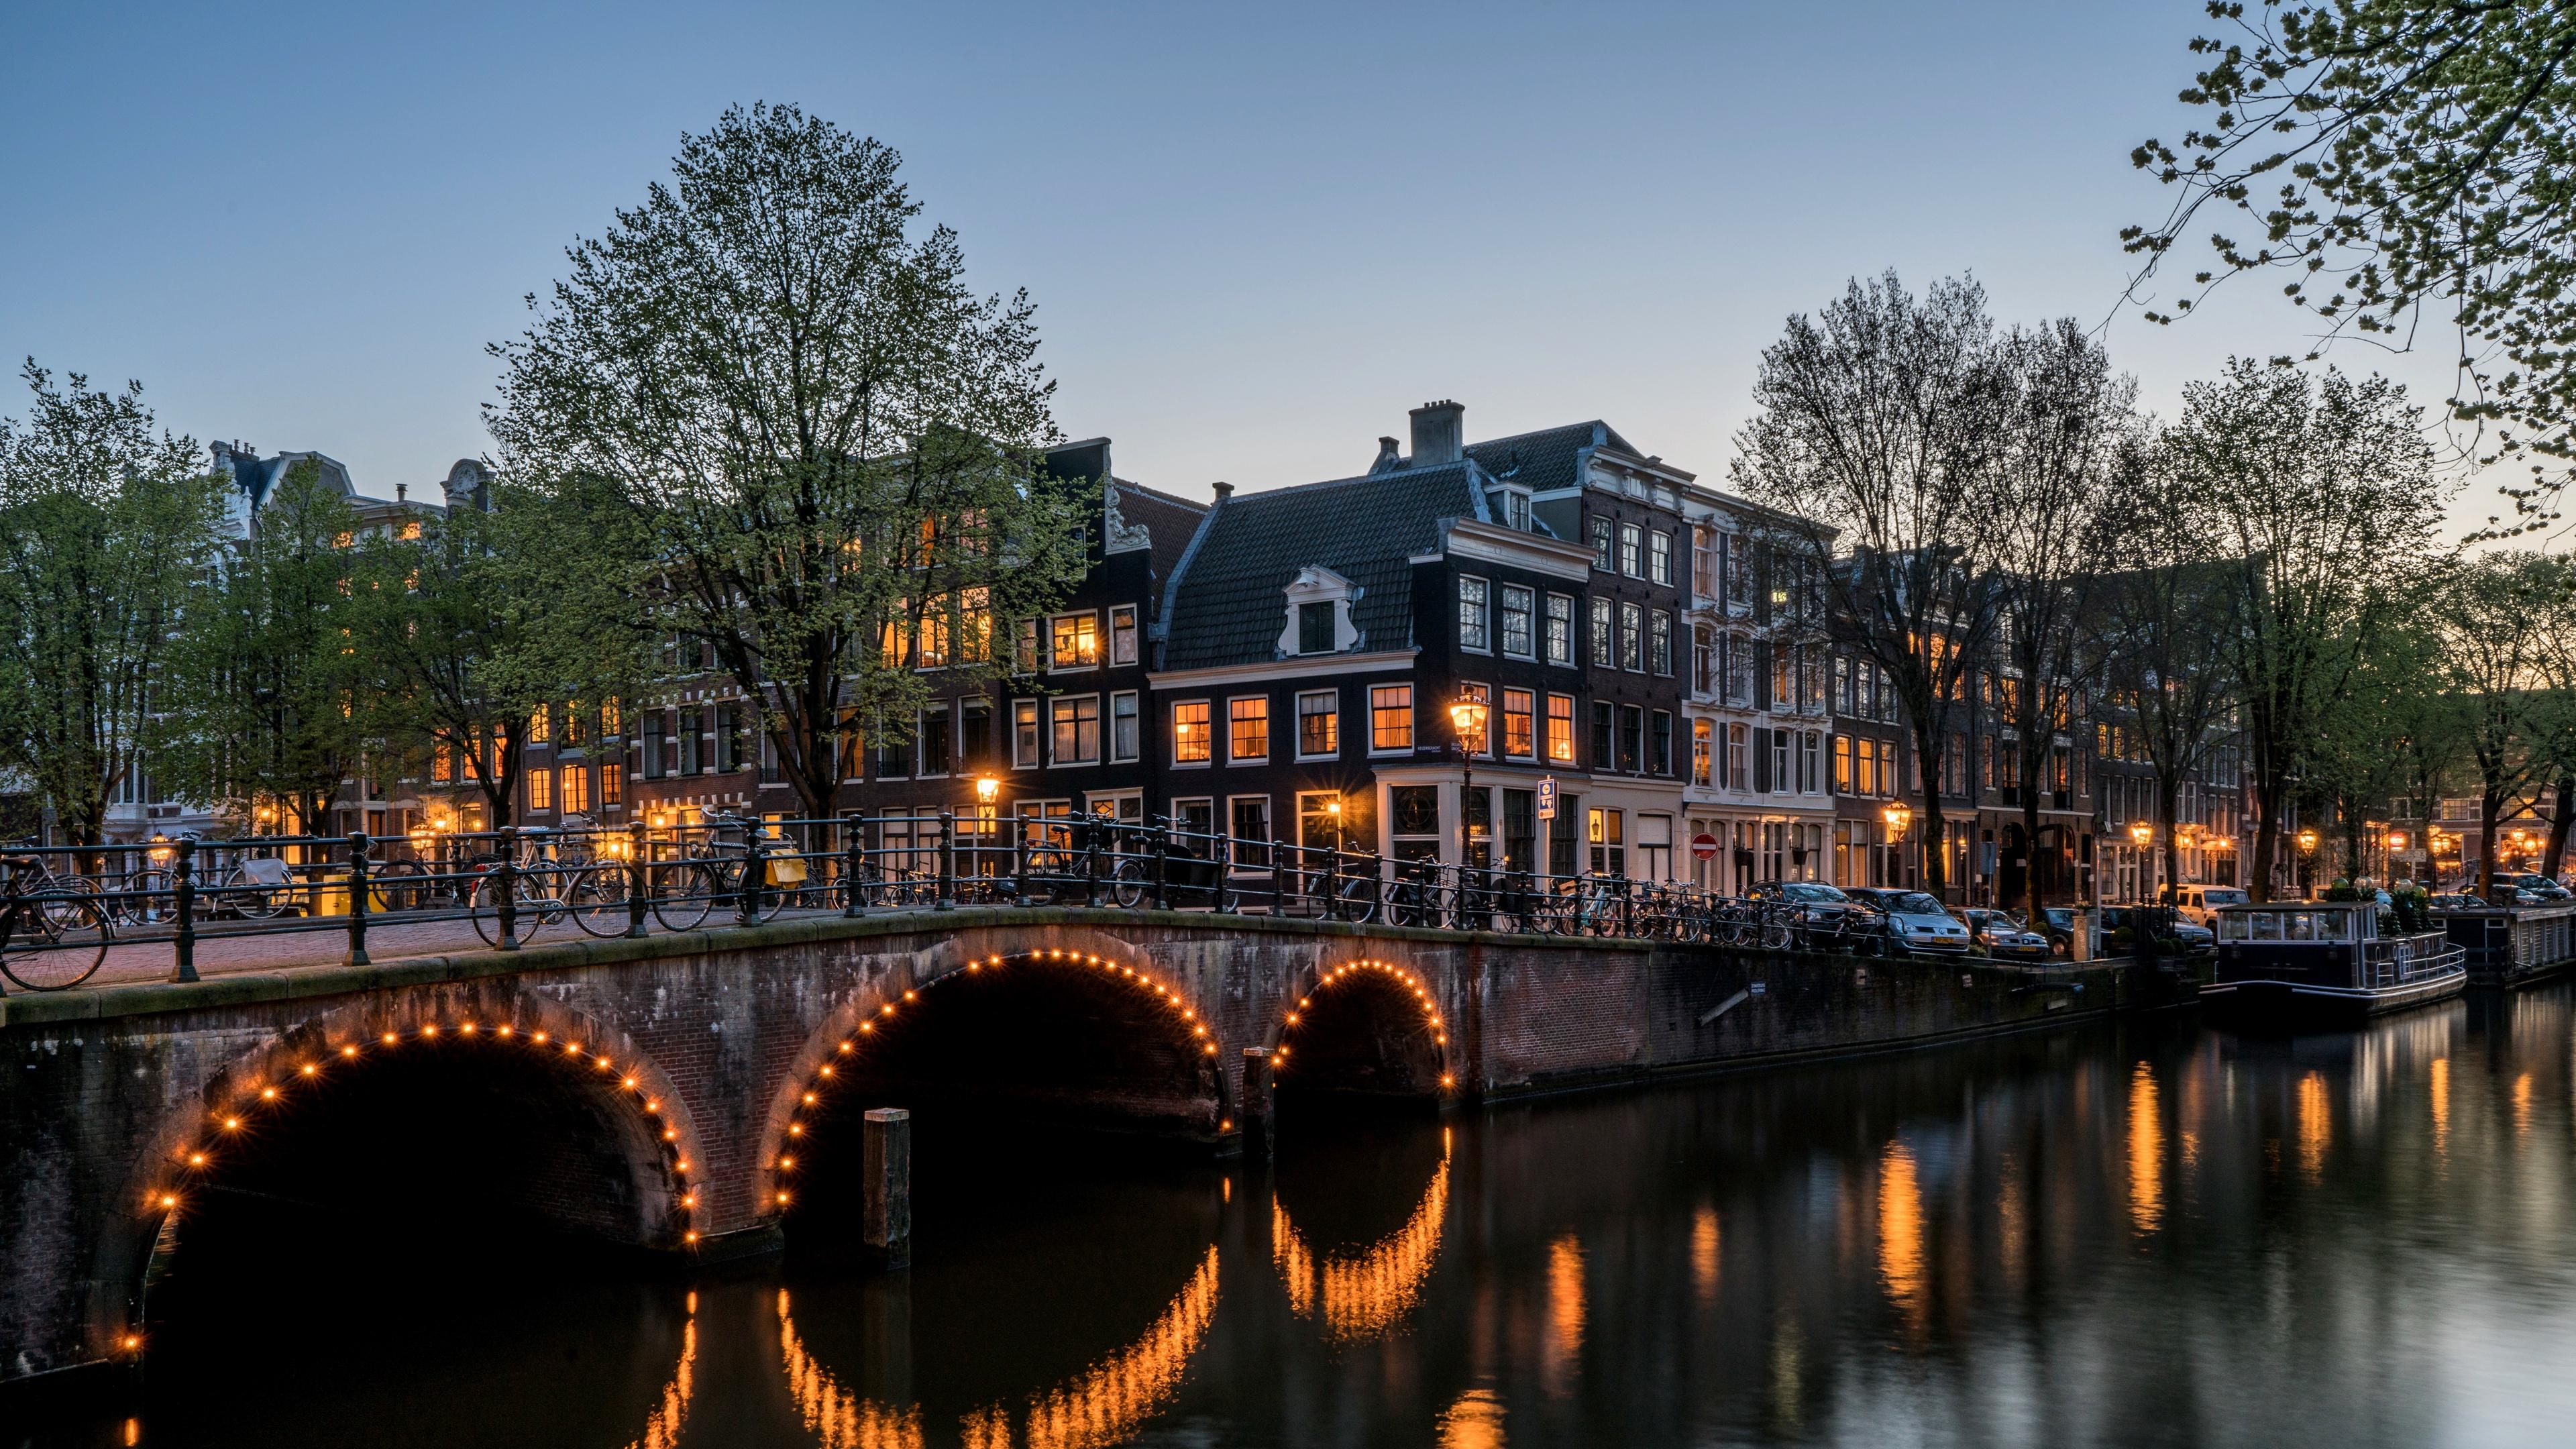 canal buildings bridge amsterdam keizersgracht 4k 1538066402 - canal, buildings, bridge, amsterdam, keizersgracht 4k - Canal, buildings, bridge